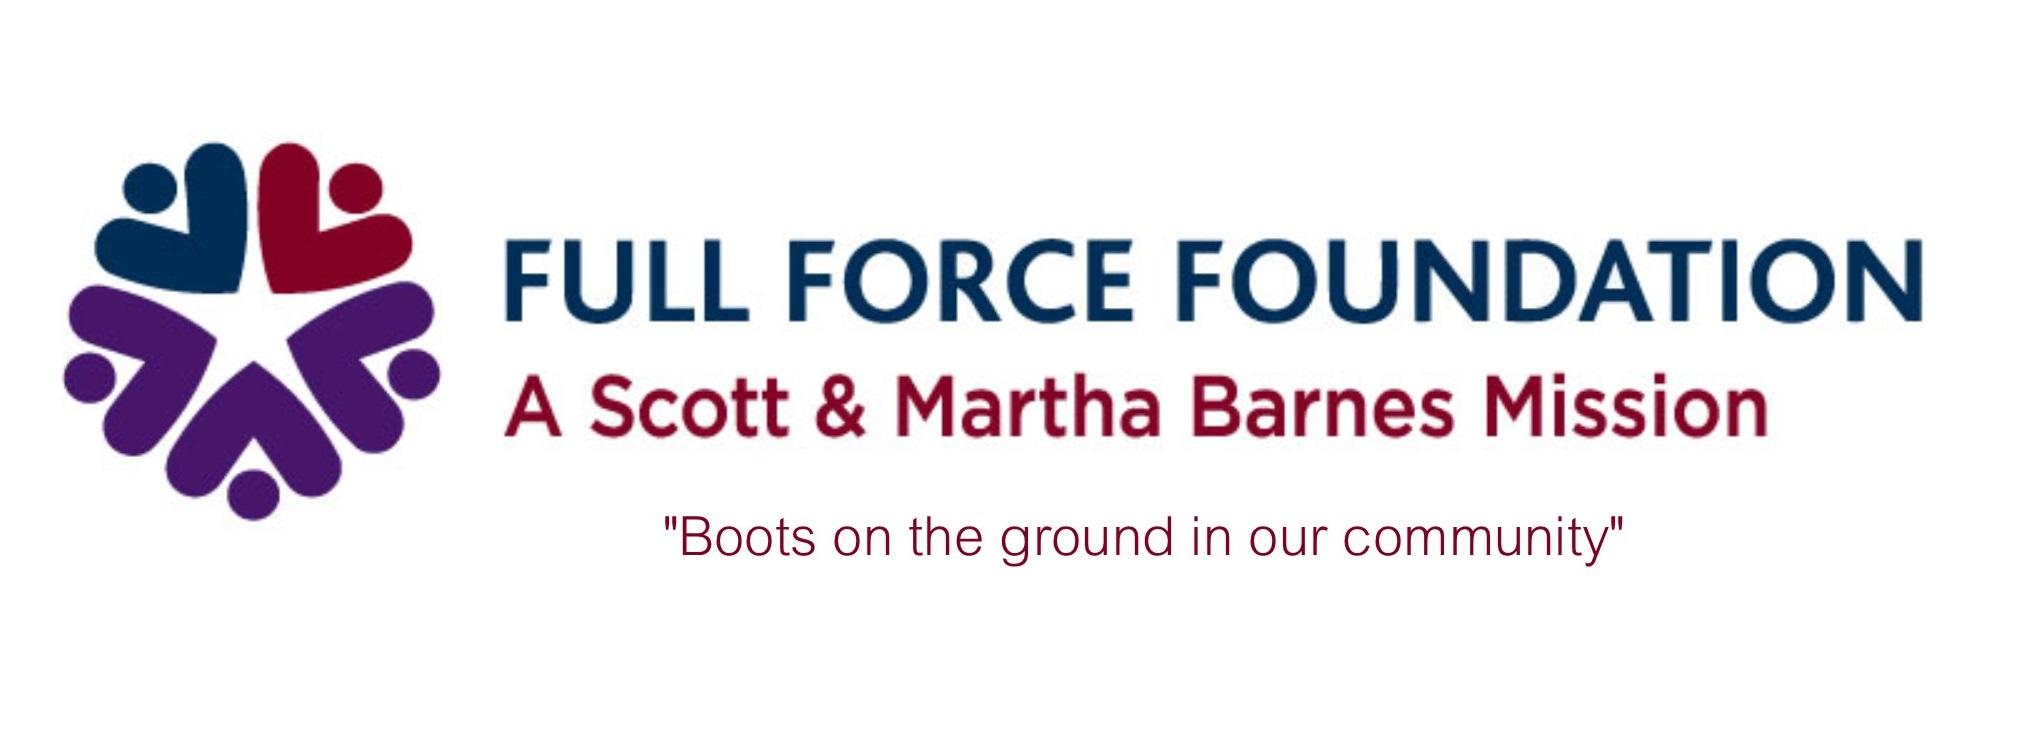 Full Force Foundation